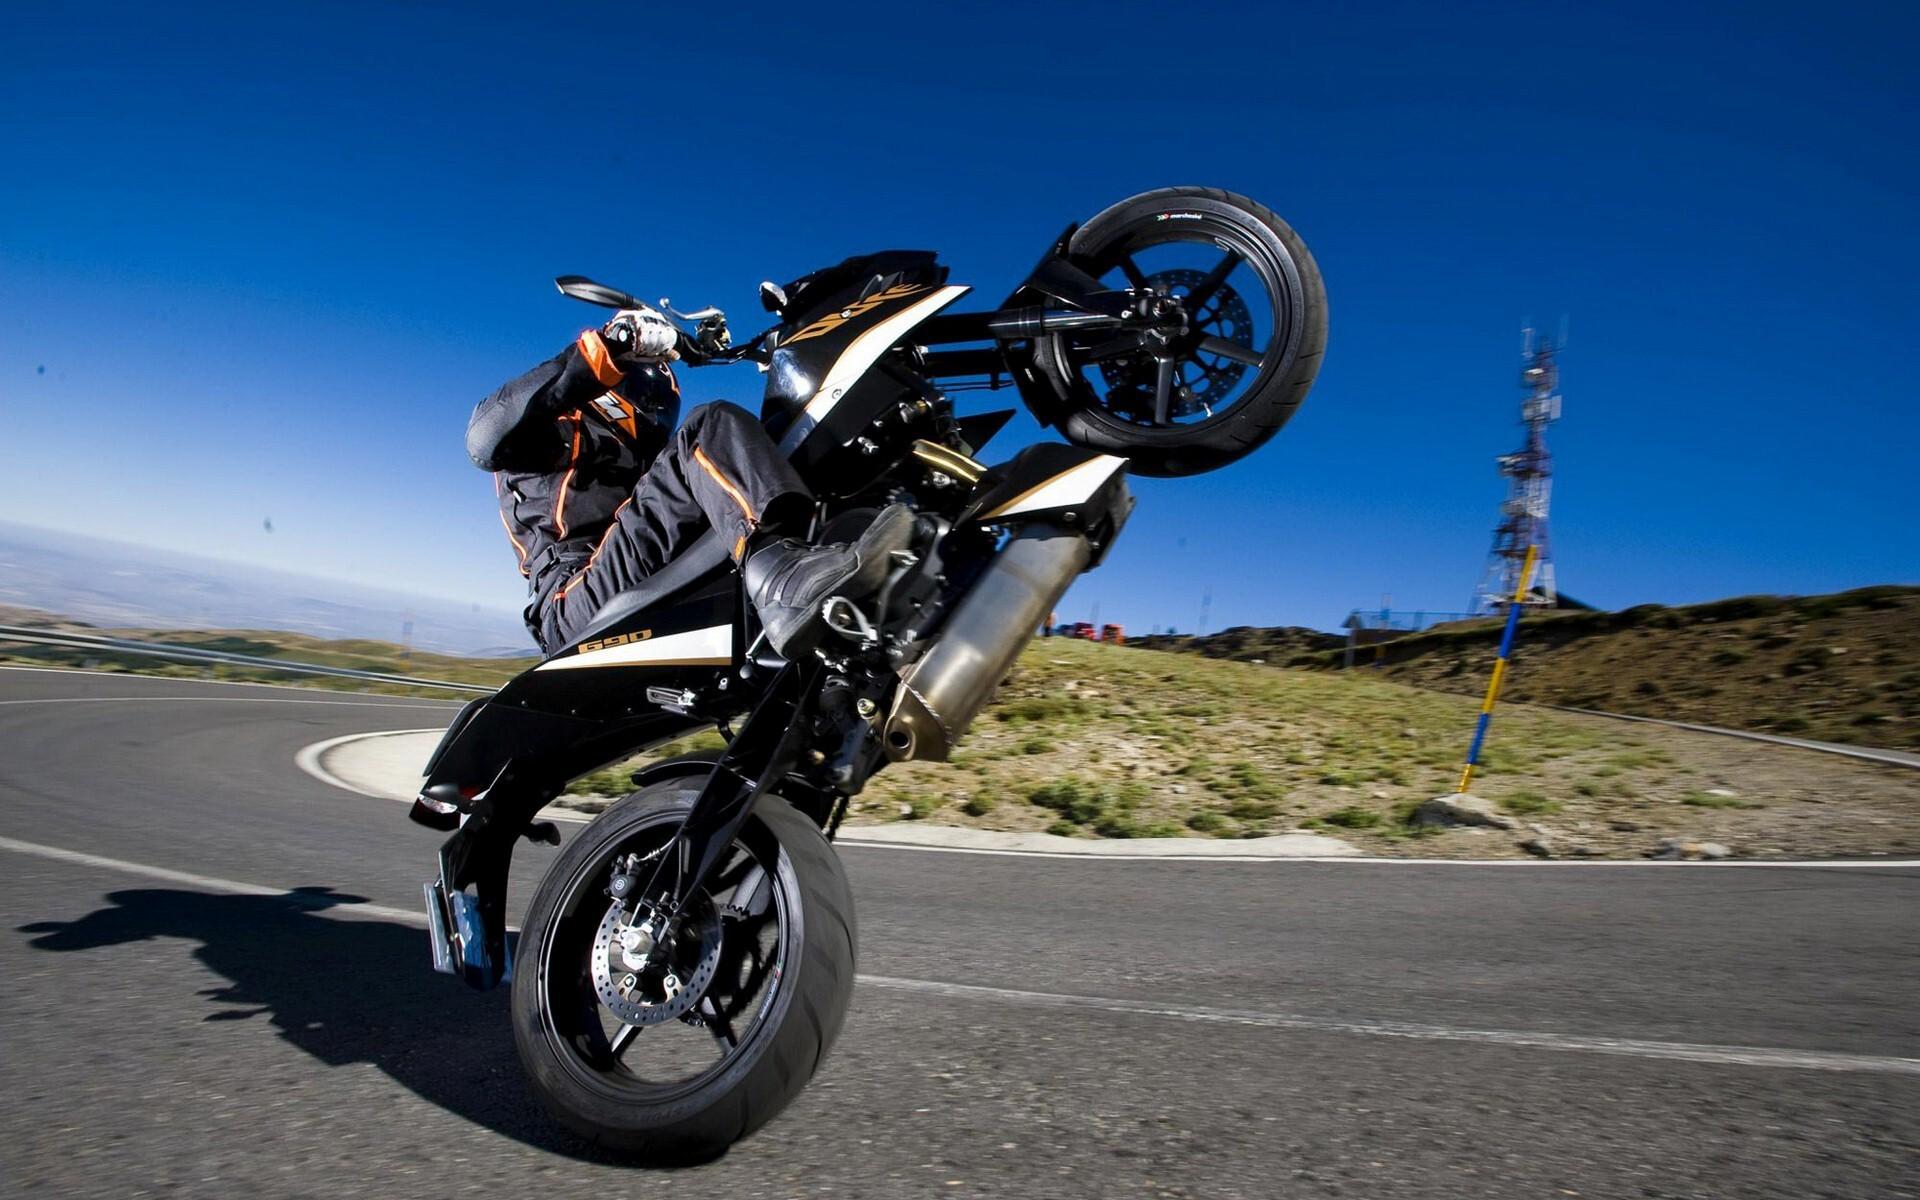 Ktm Duke Bike Stunt On Road Hd Wallpapers